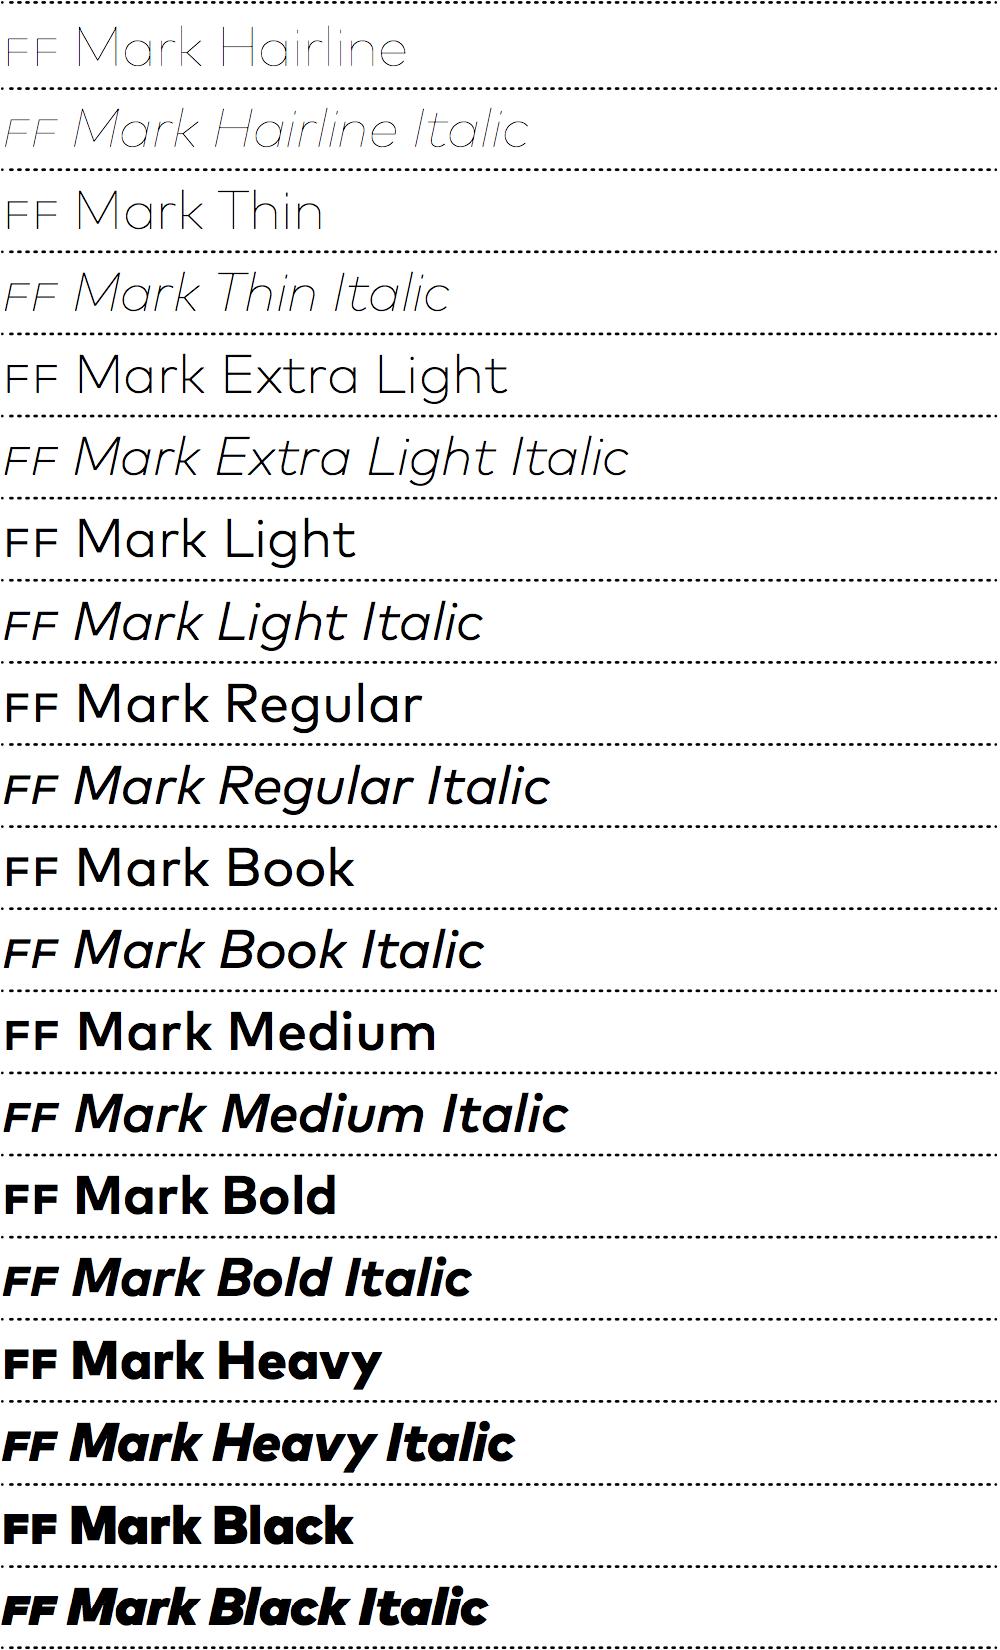 FF Mark: Schriftschnitt-Übersicht